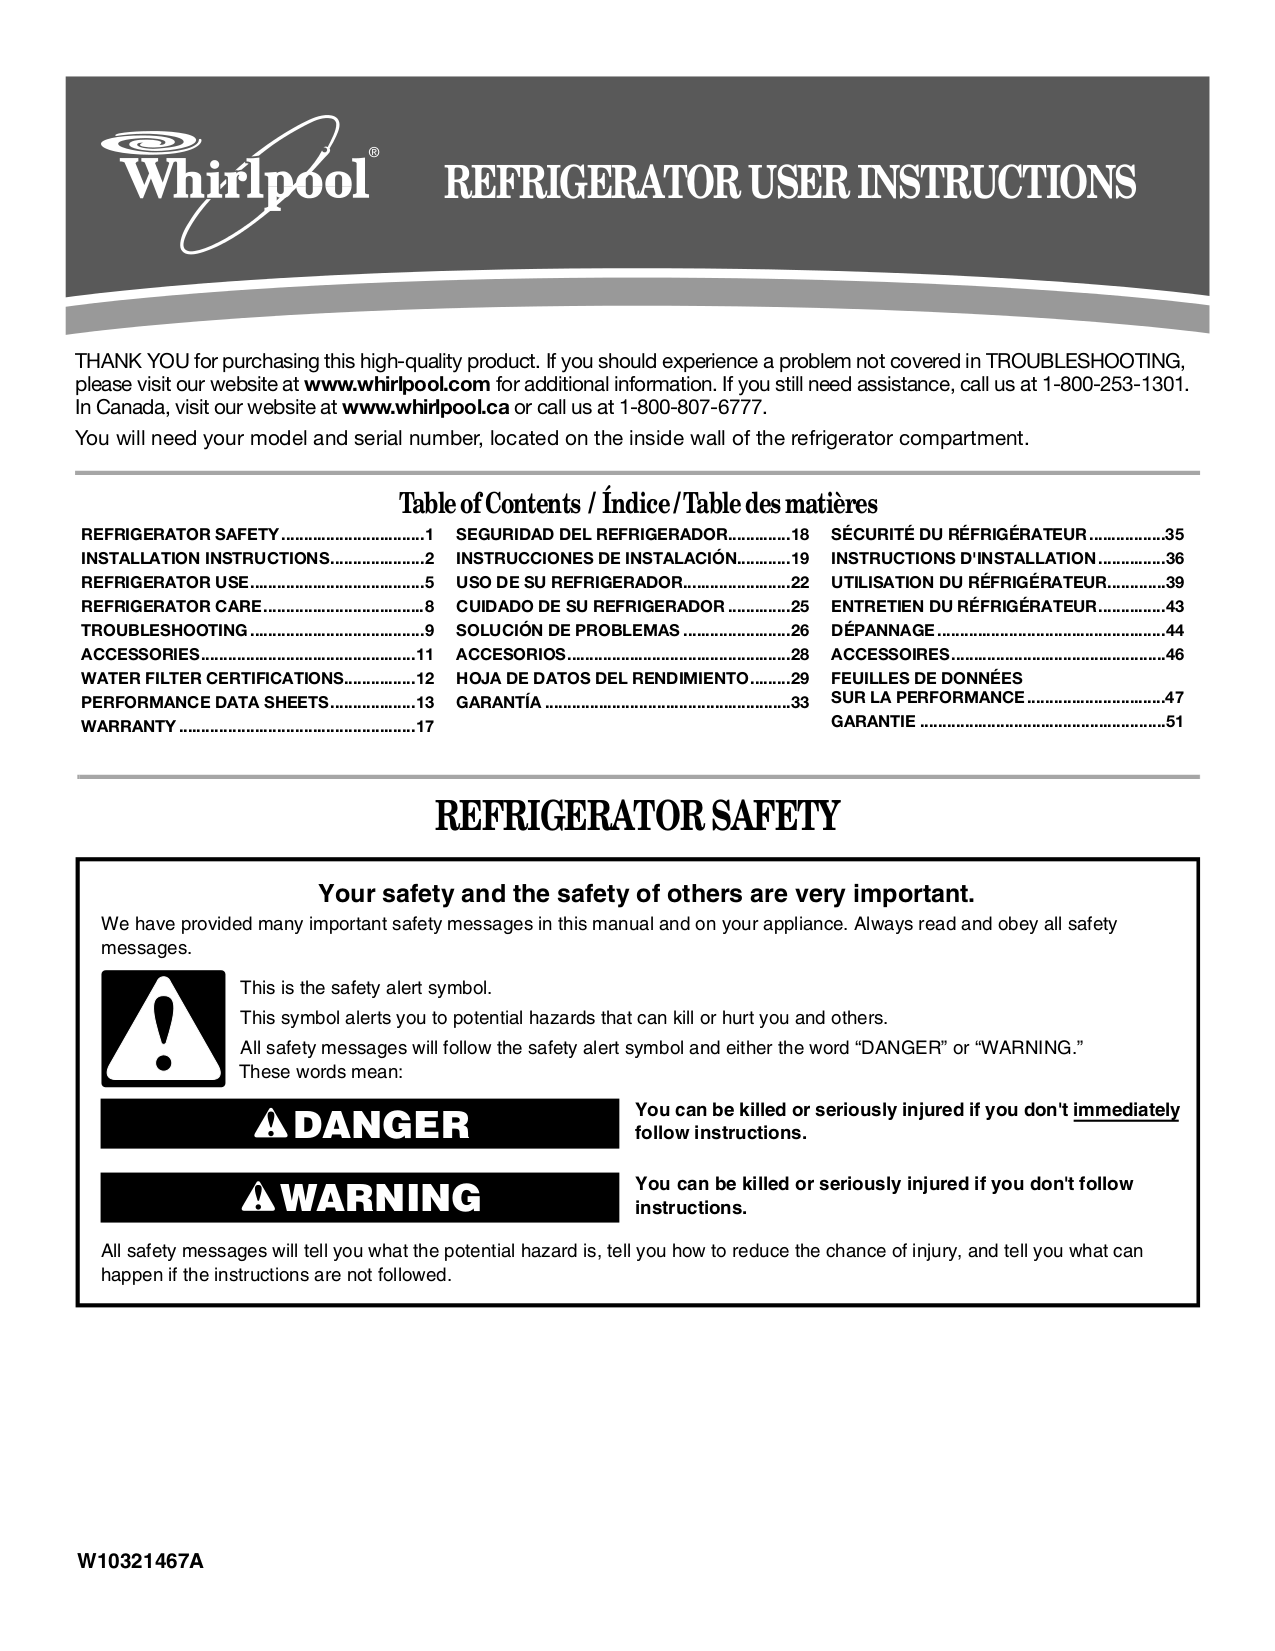 download free pdf for whirlpool ed2kvexvl refrigerator manual rh umlib com whirlpool refrigerator manual pdf whirlpool fridge manual cb635